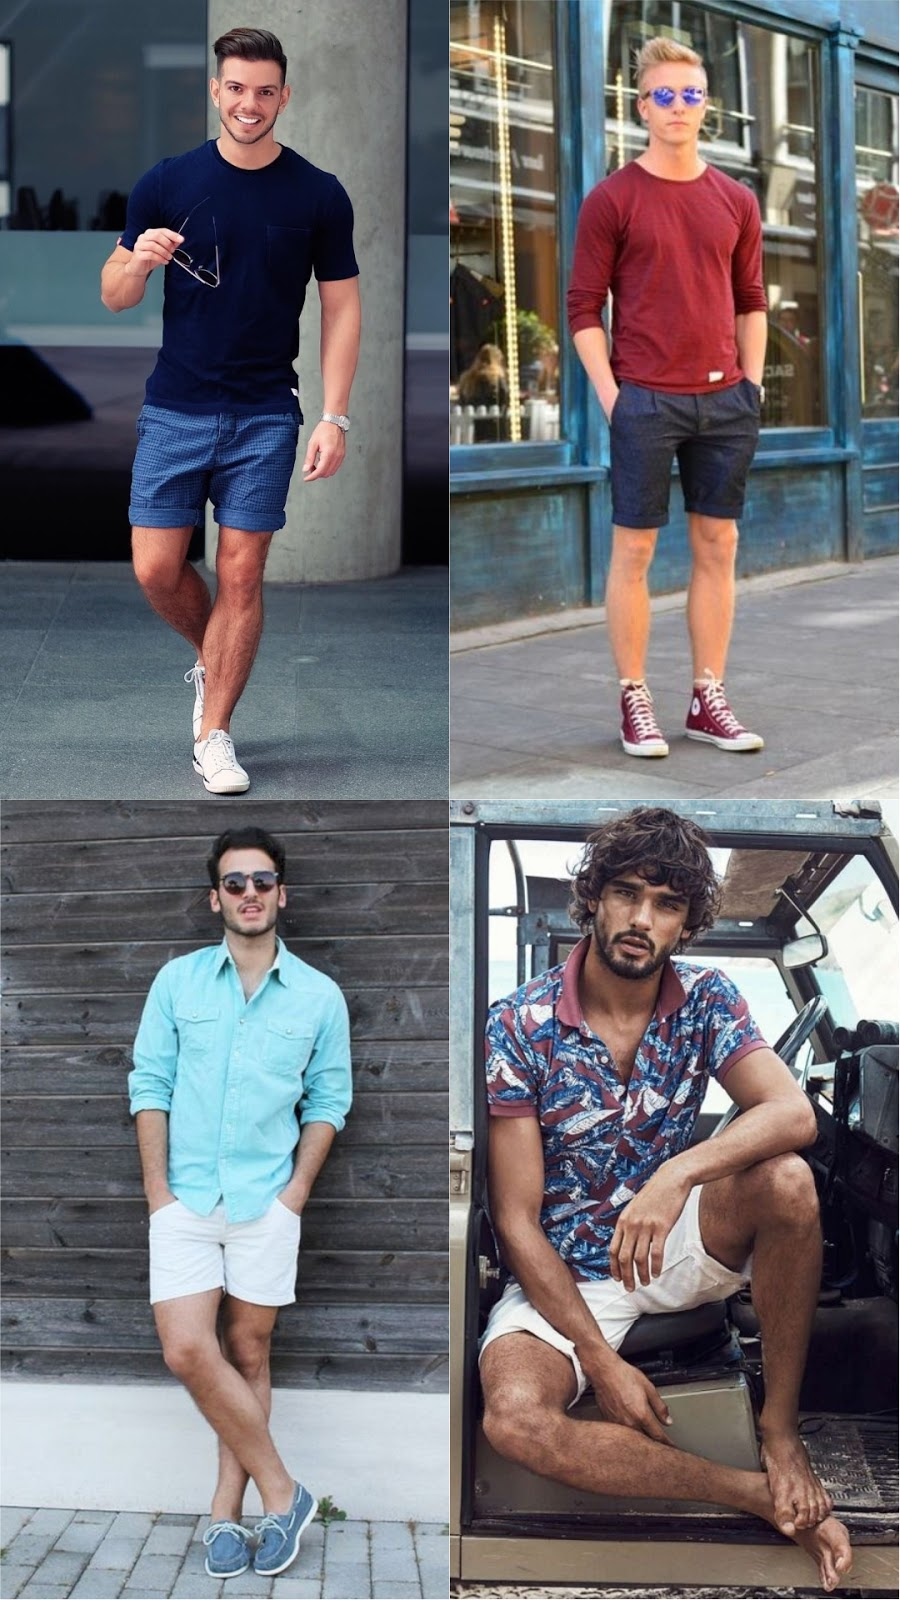 tendencias-moda-masculina-primavera-verao-2019-blog-tres-chic-short-curto-masculino